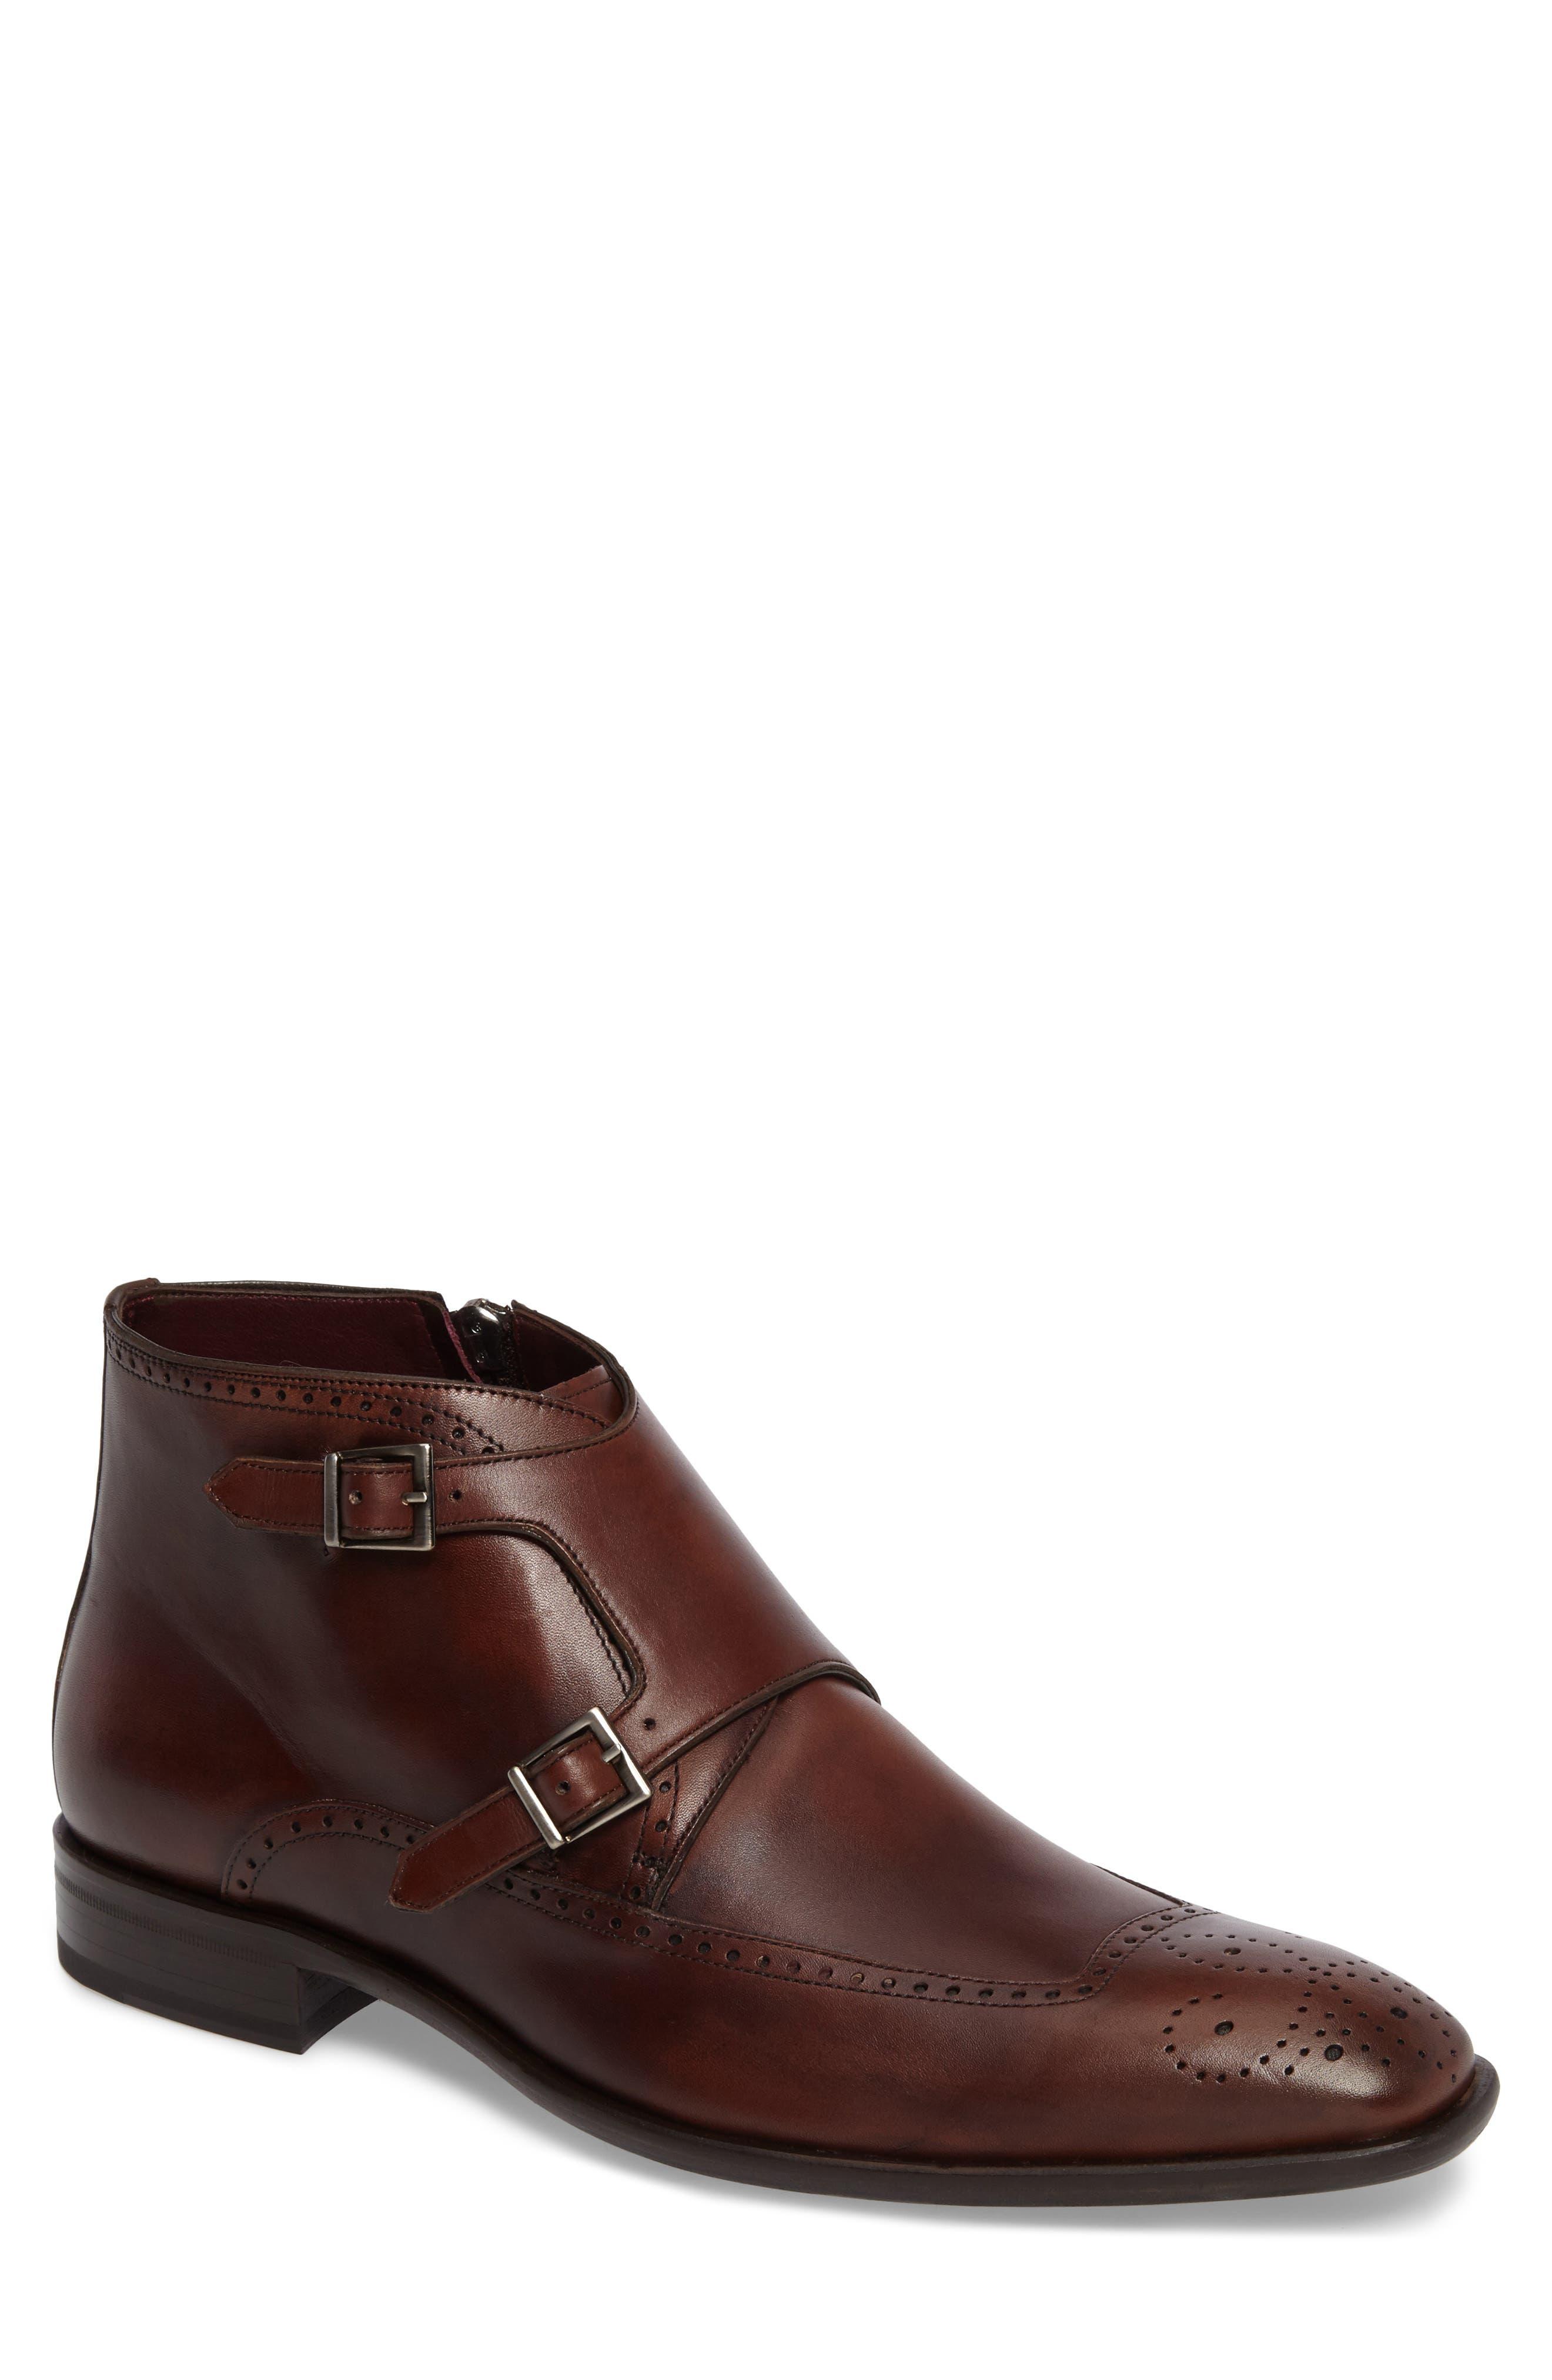 Alternate Image 1 Selected - Mezlan Taberna Double Monk Strap Boot (Men)